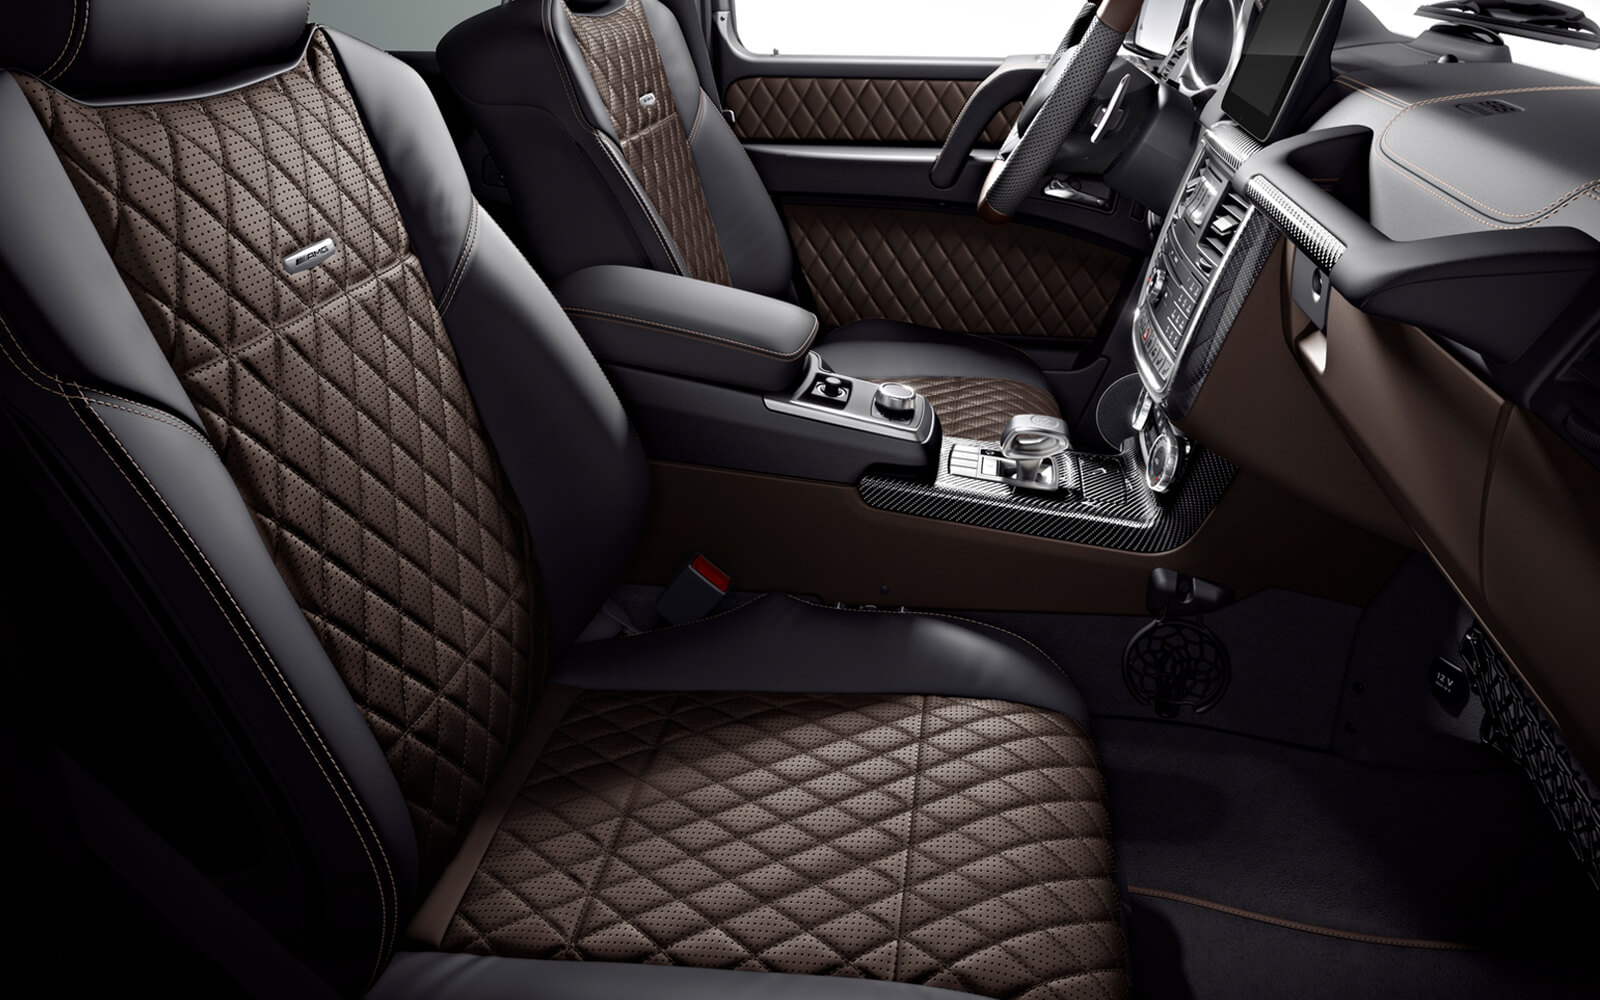 Mercedes-AMG-G63-50th-Anniversary-7